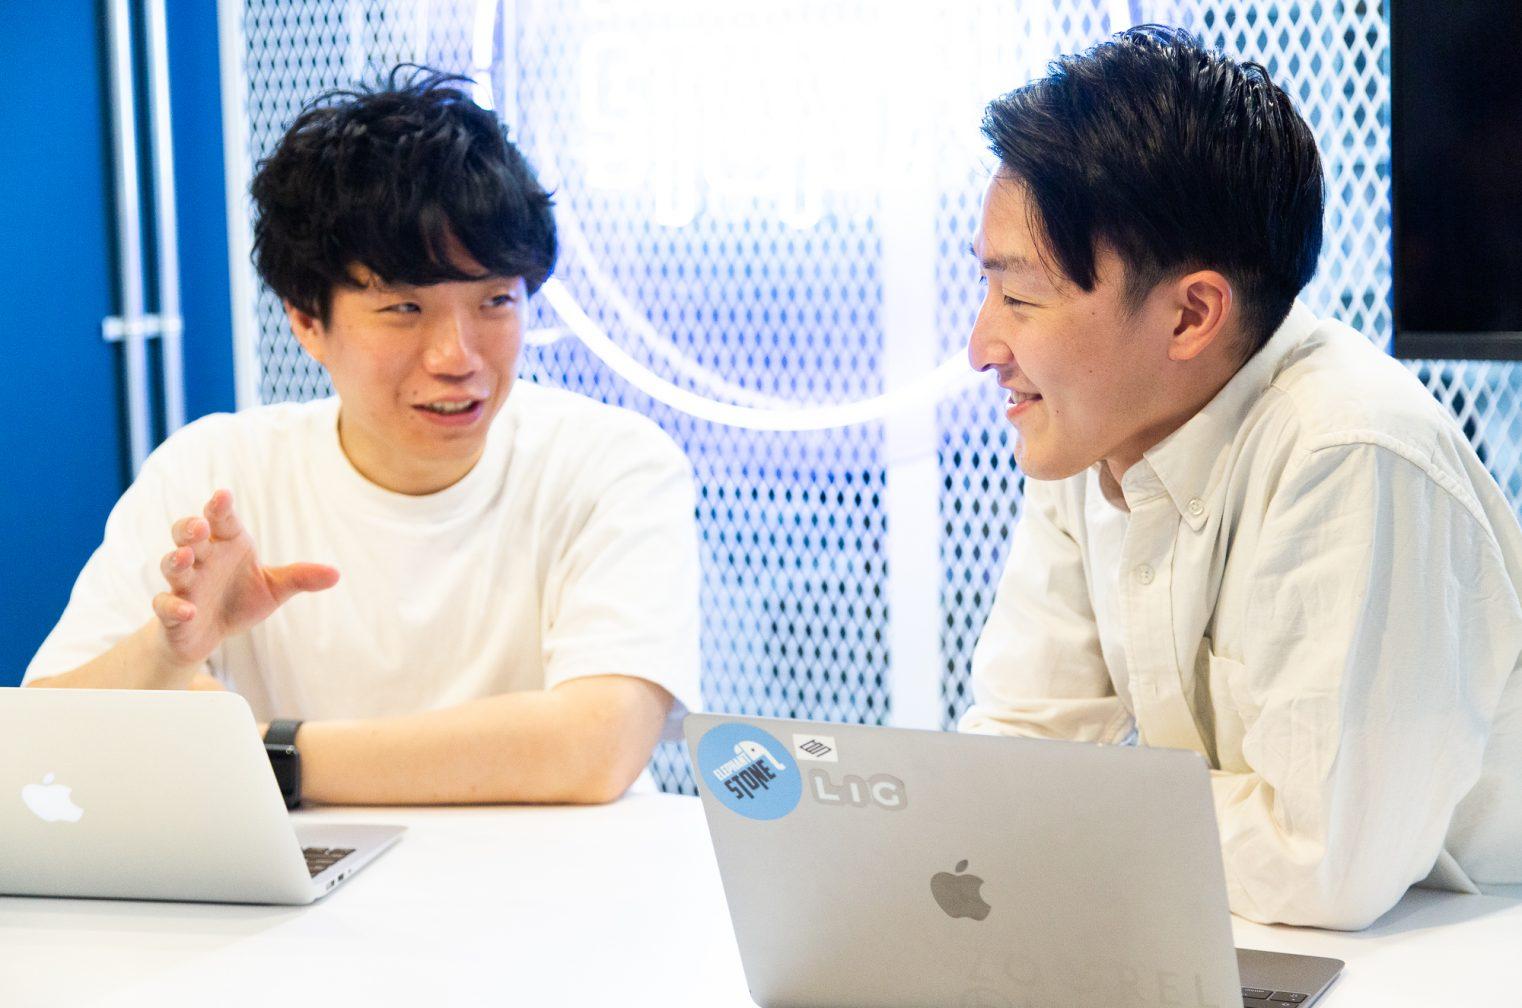 J-LODが最大1,000万円までブランディング映像制作の経費を補助!申請時の6つのポイントとは?